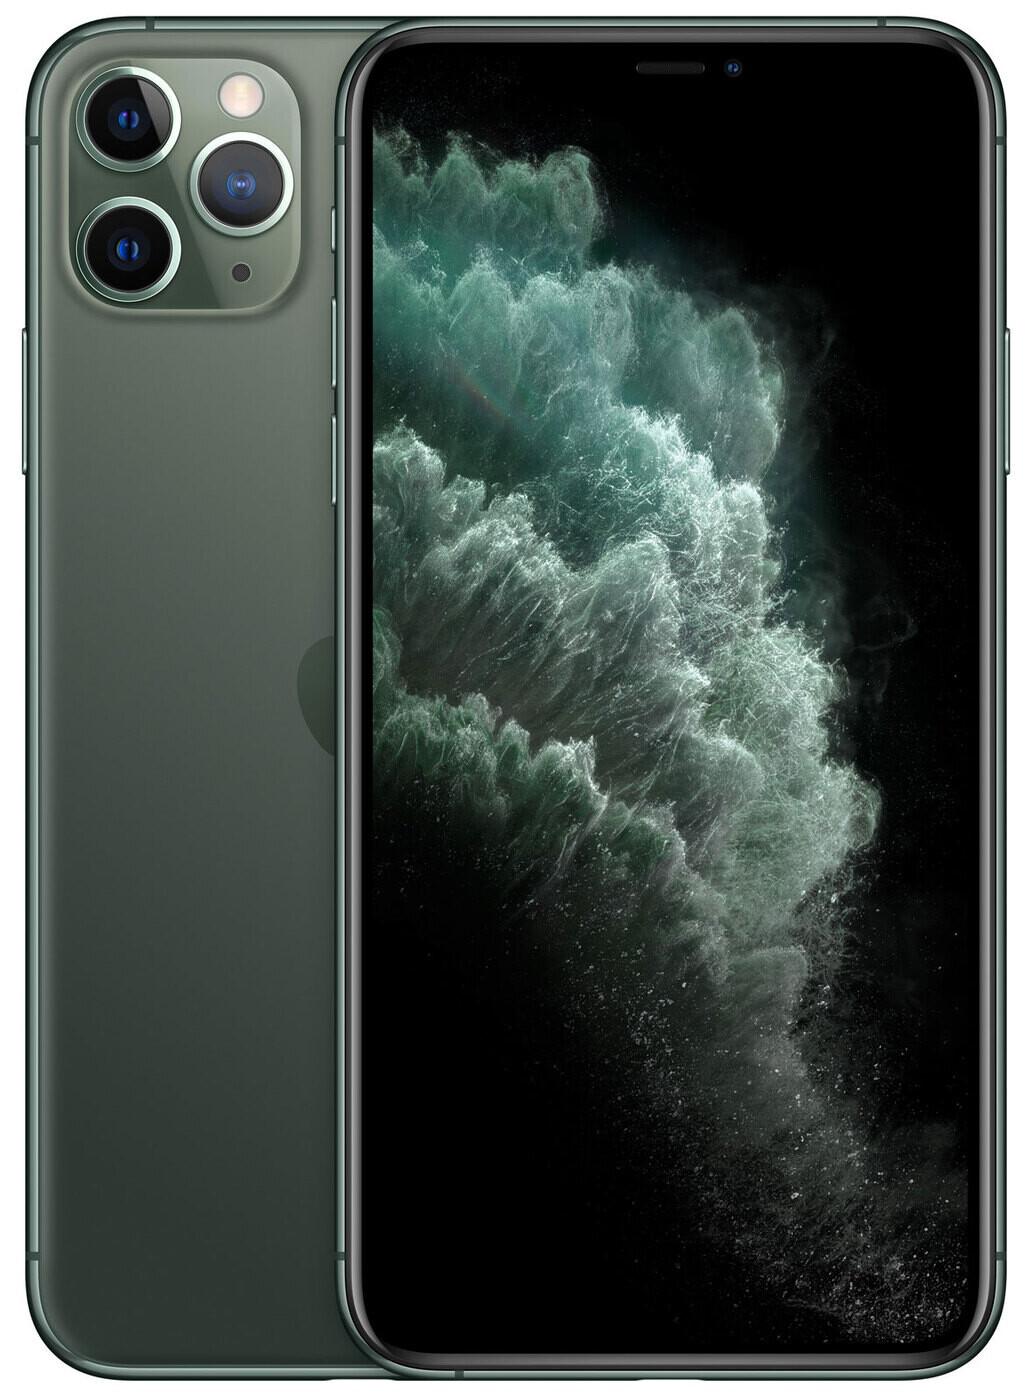 Apple iPhone 11 Pro 512Gb MidnightGreen